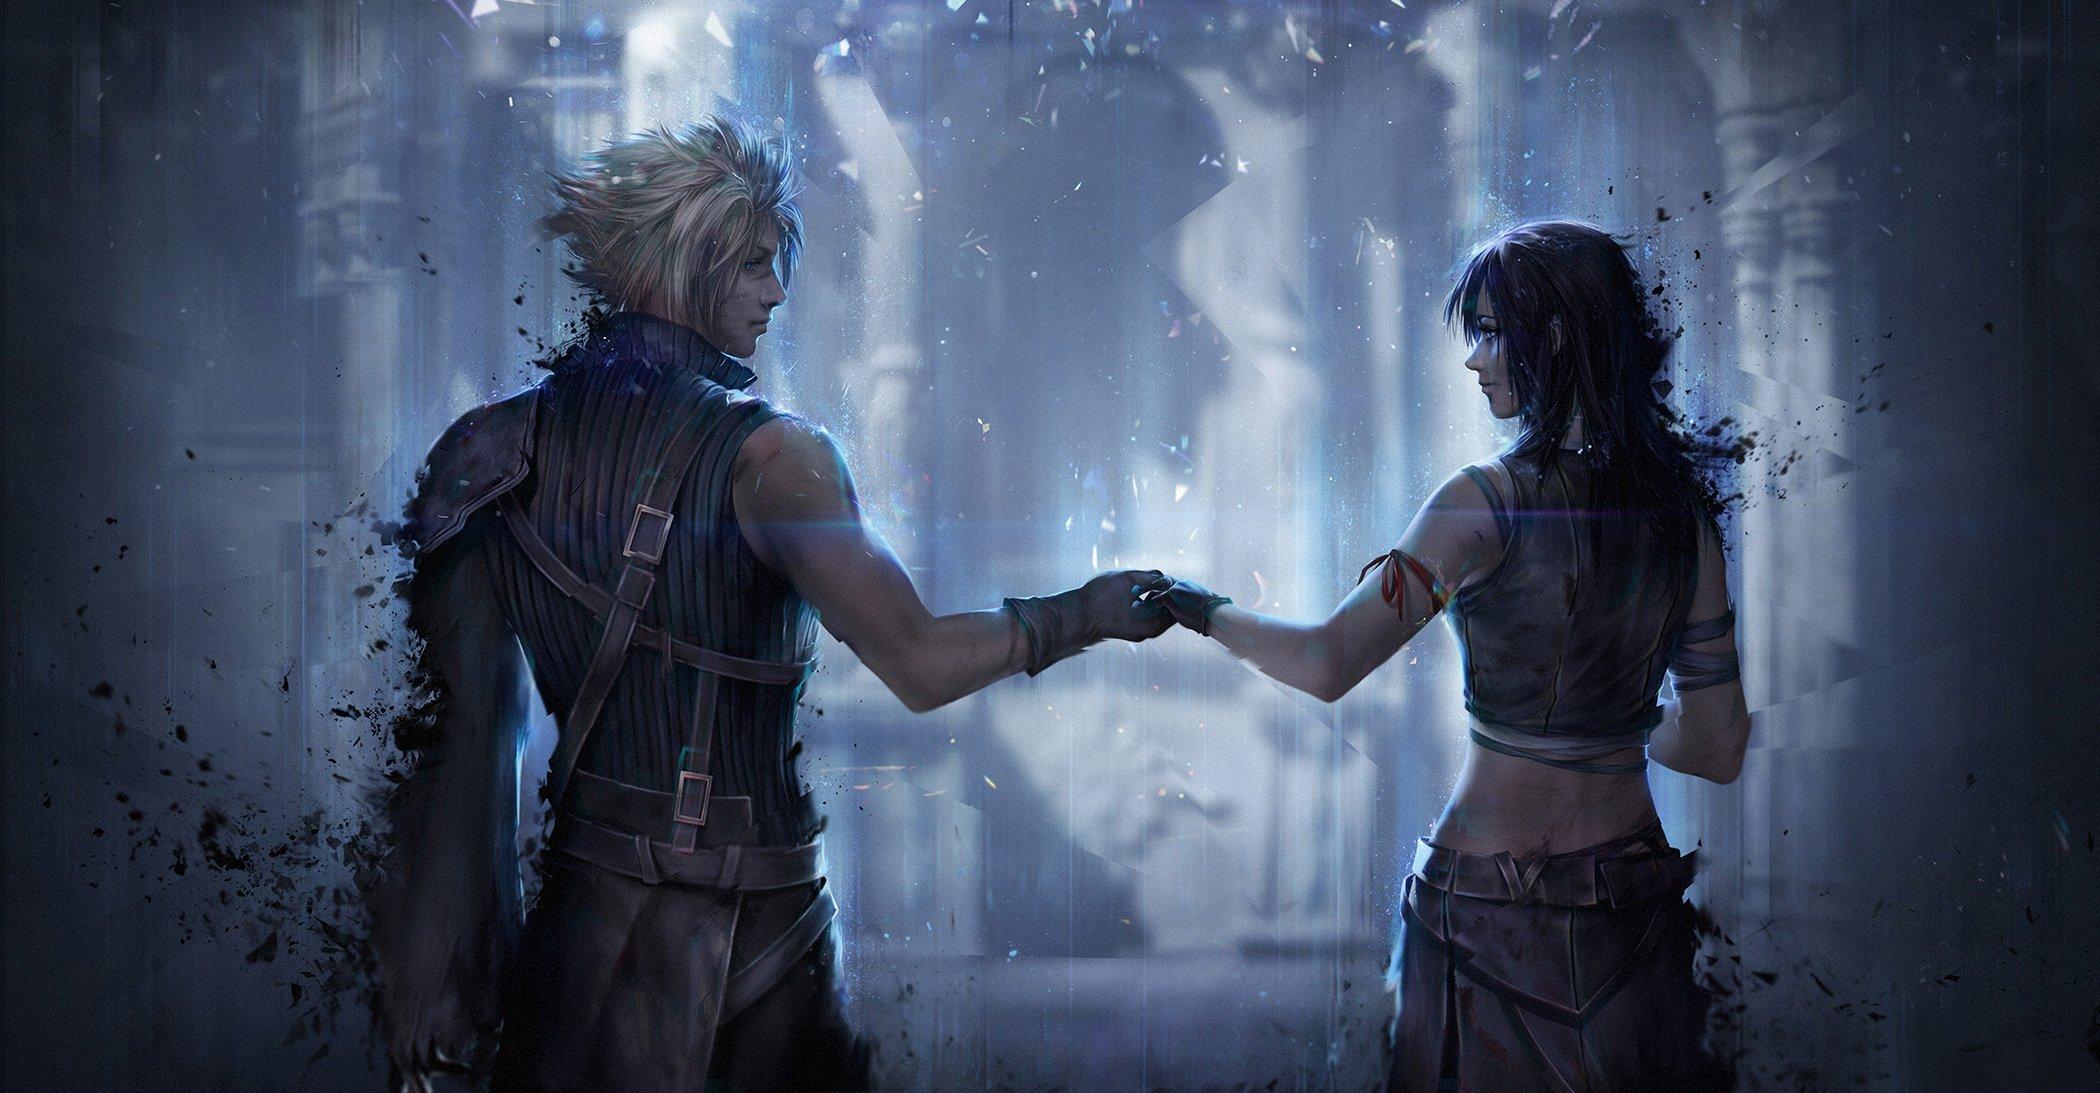 Final Fantasy VII HD Wallpaper